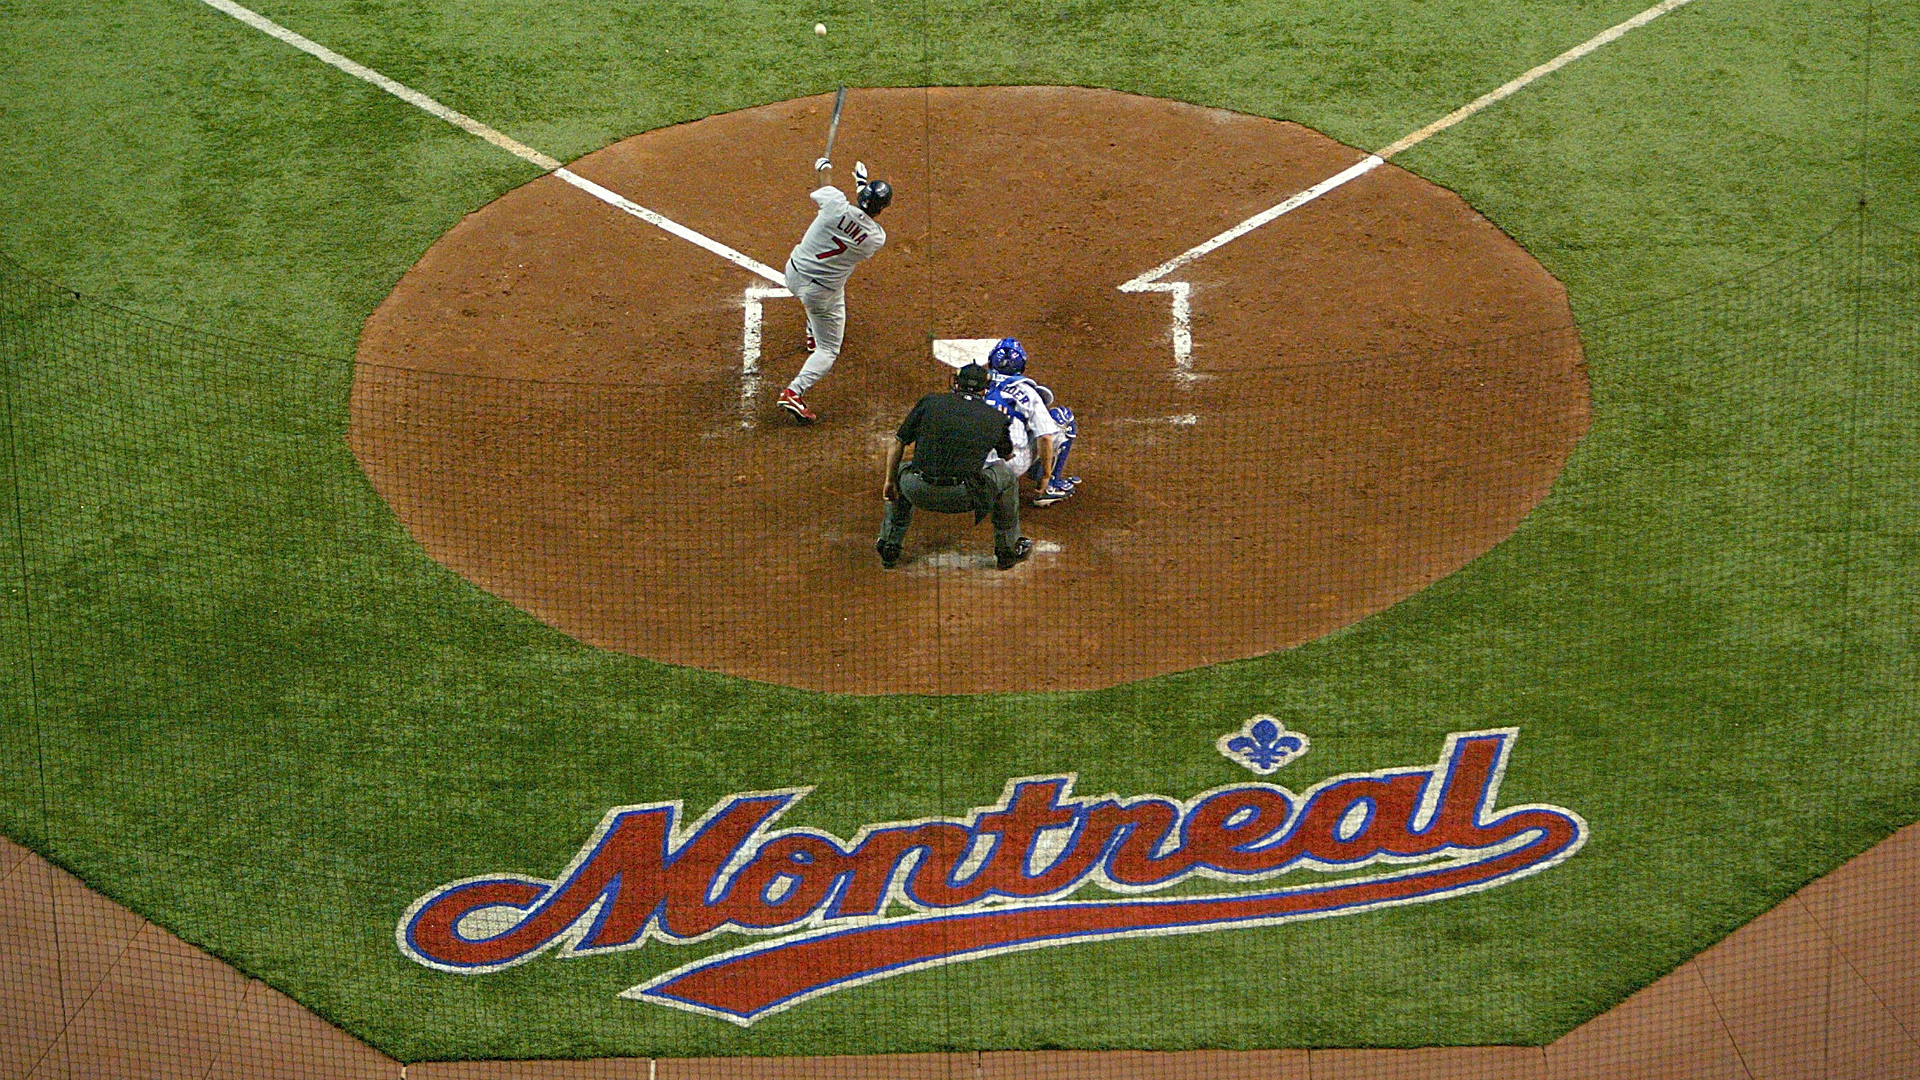 Montreal-Expos-baseball-FTR-Getty.jpg